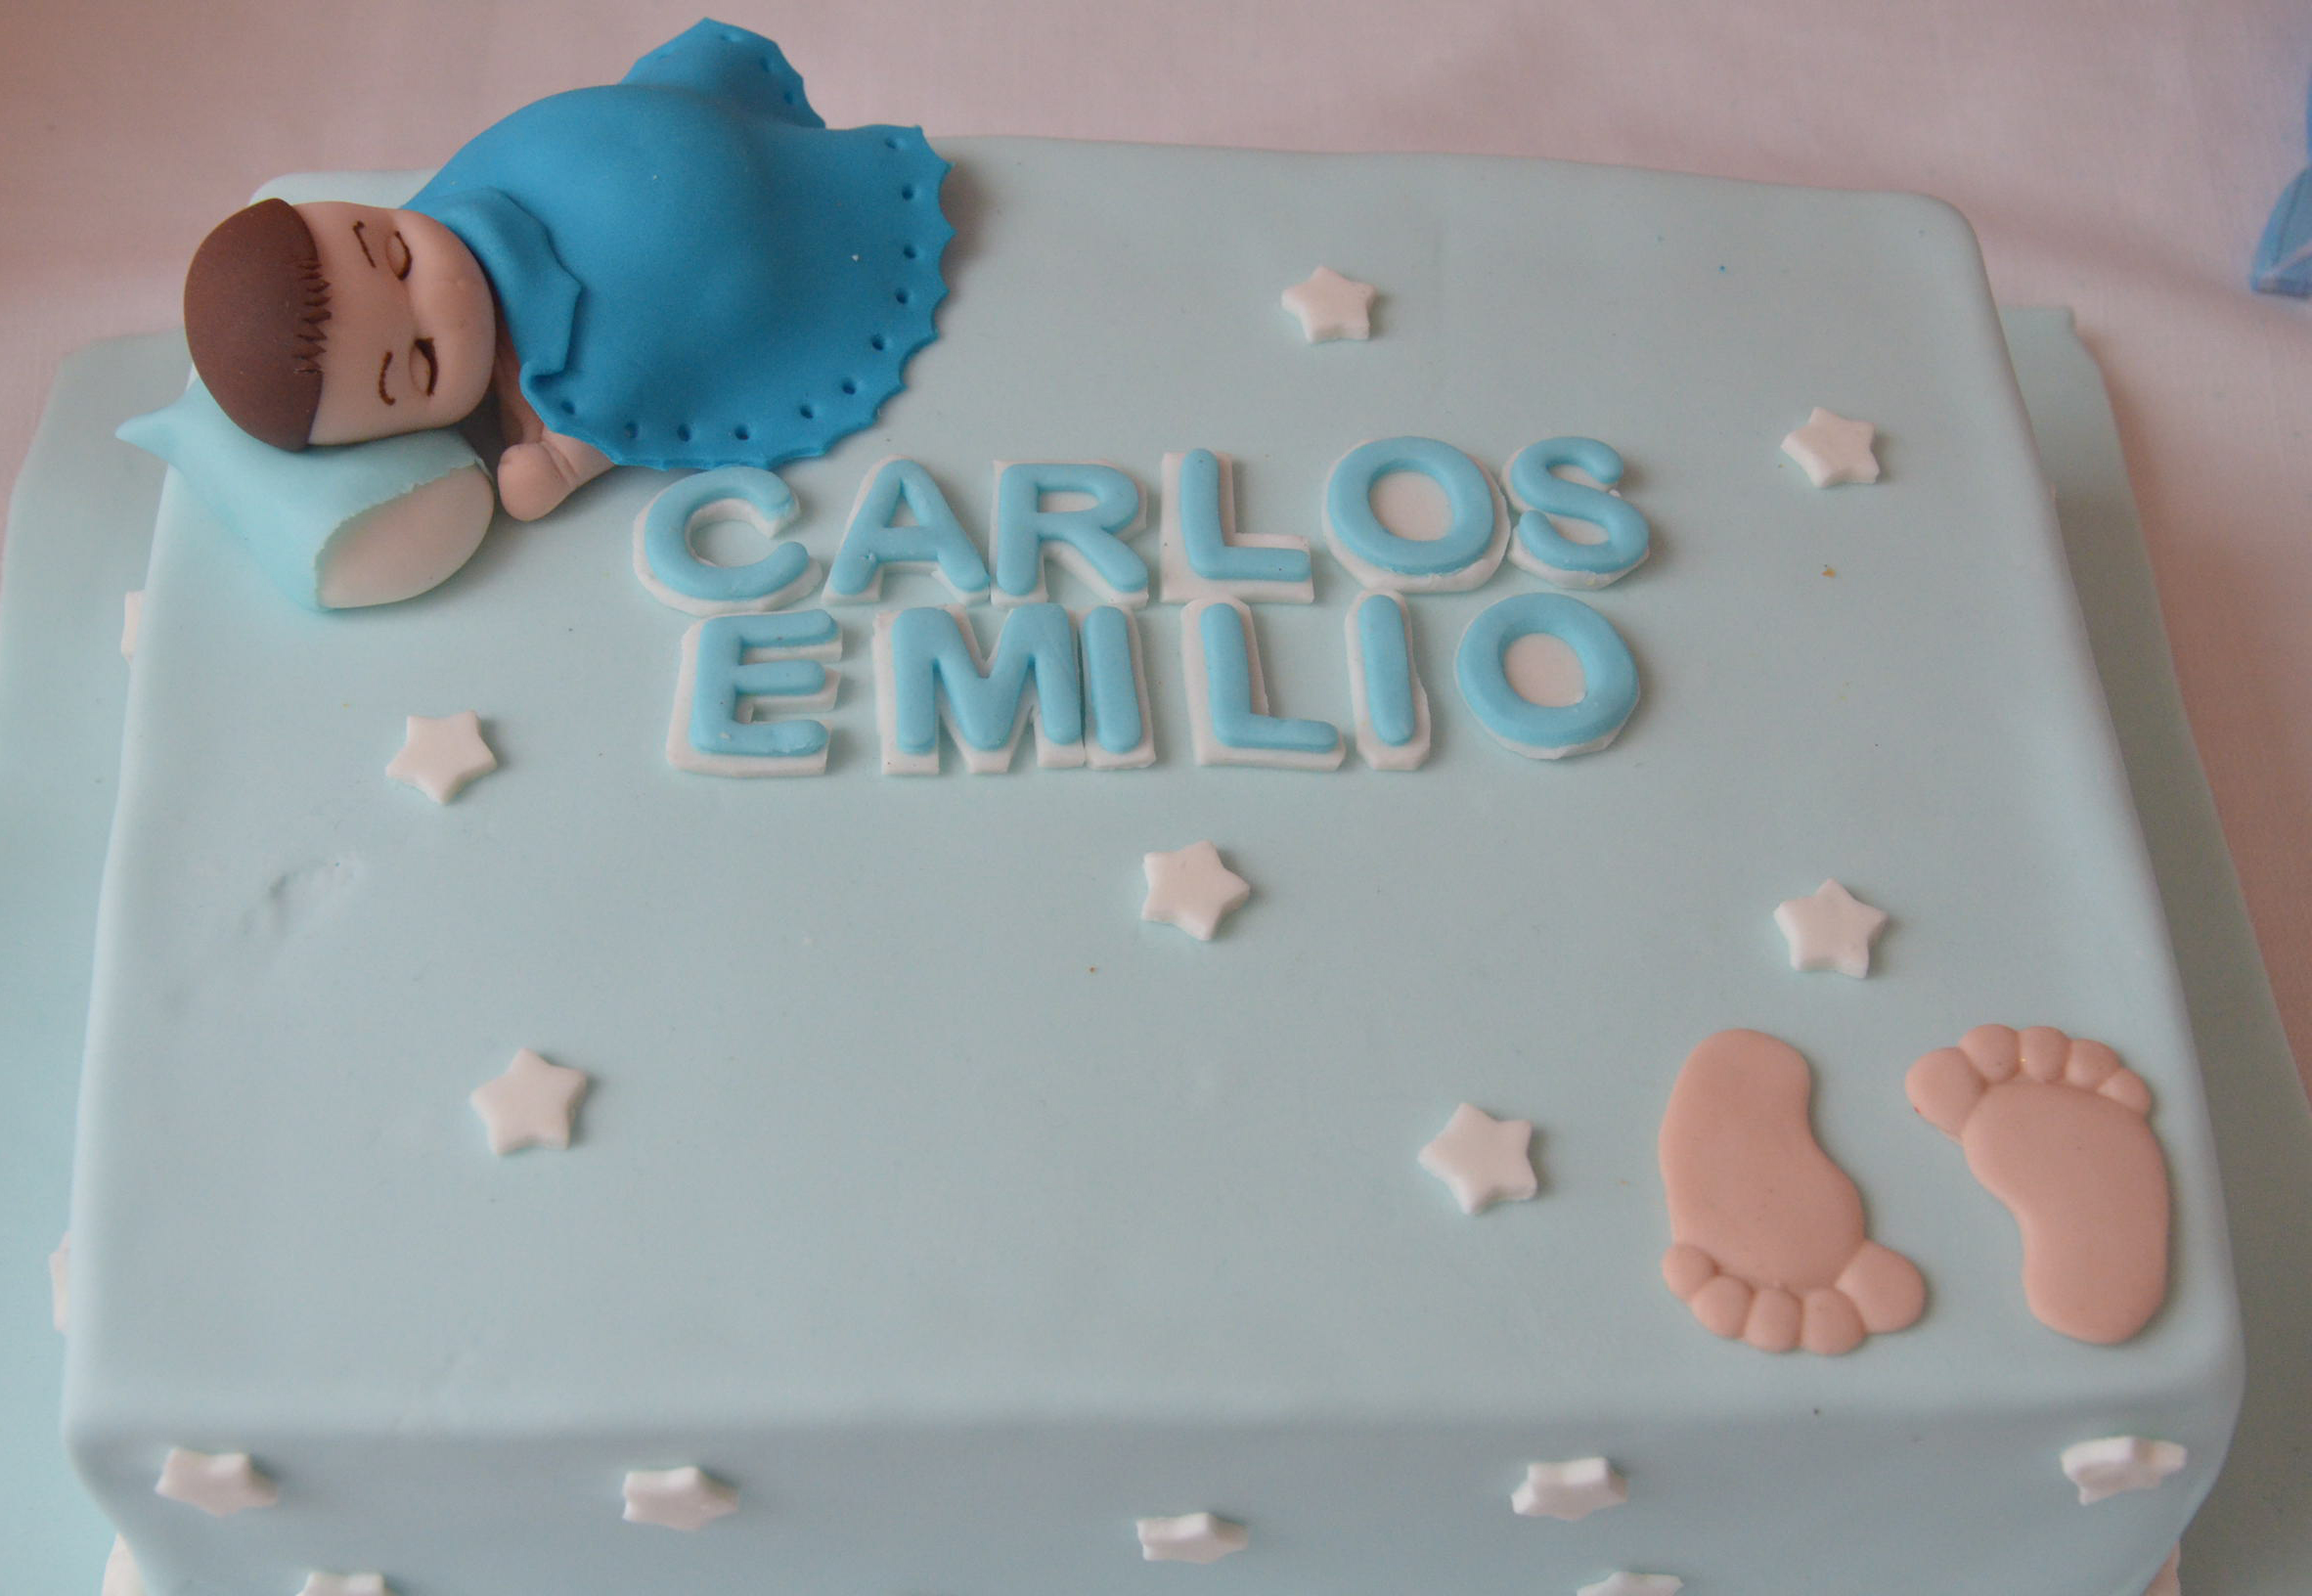 ¡Se llamará  Carlos  Emilio!